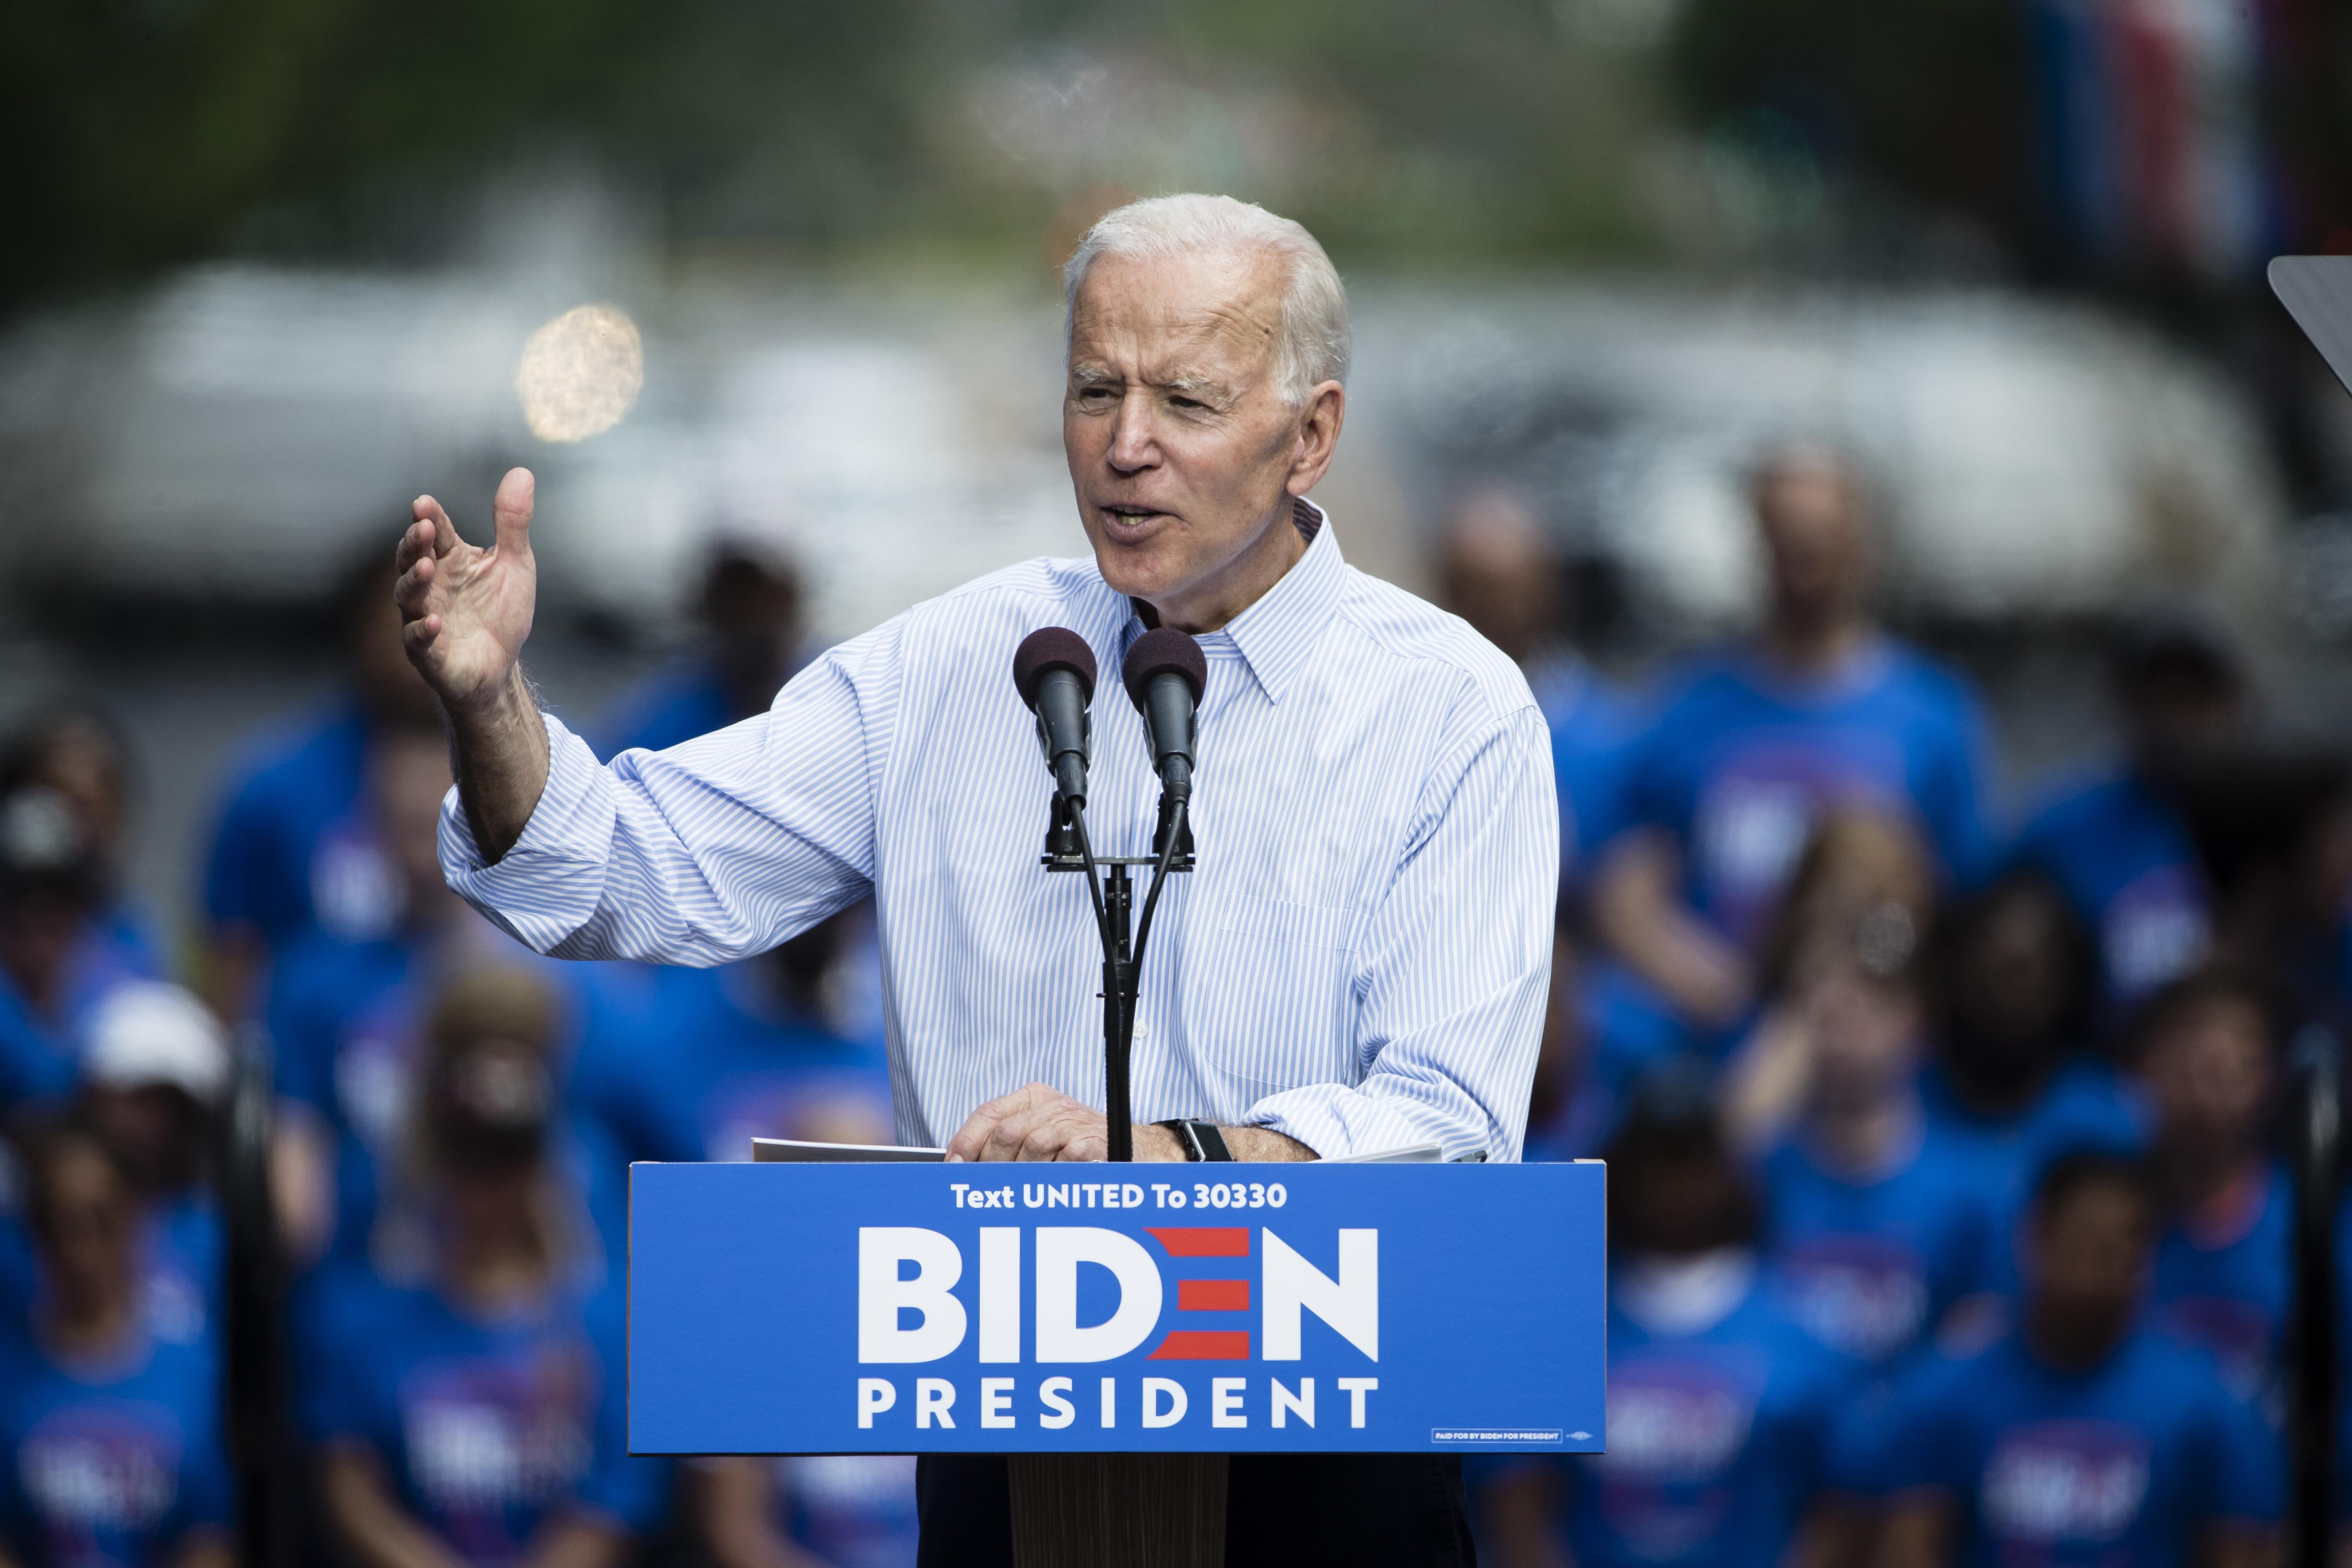 Activists prod 2020 Democratic candidates to shun bipartisan dealmaking